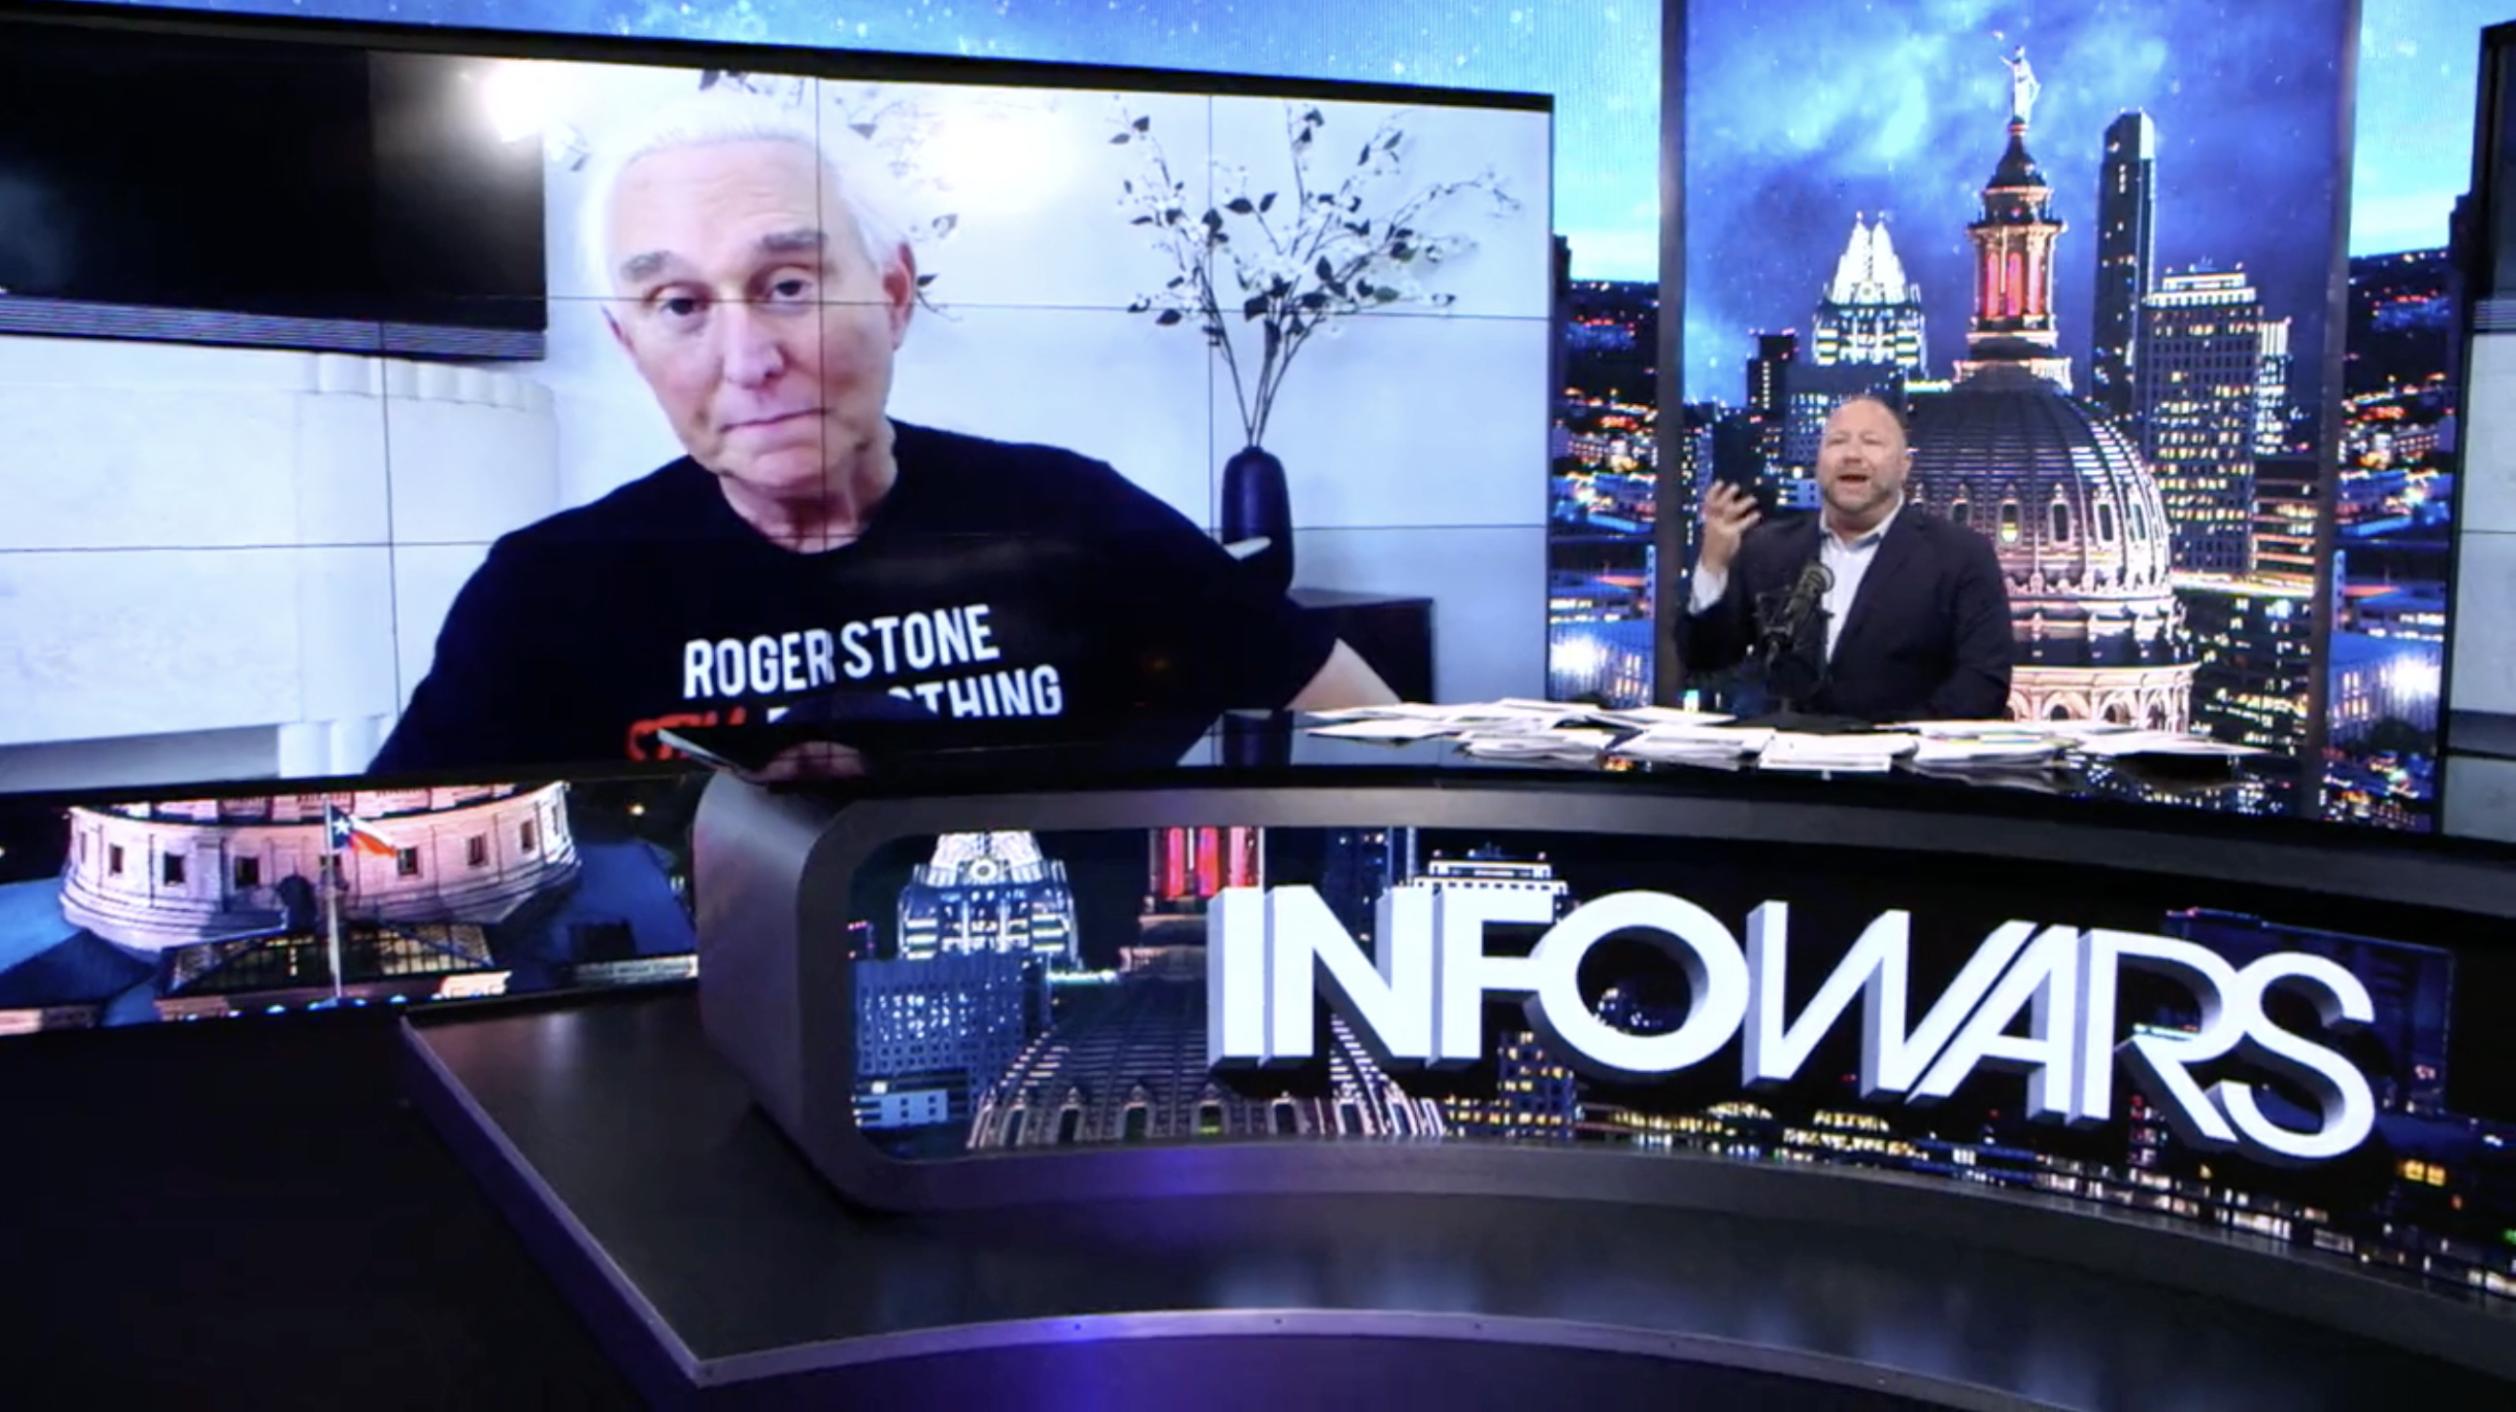 Roger Stone Alex Jones Infowars Studio Trump EXZM July 14th 2020